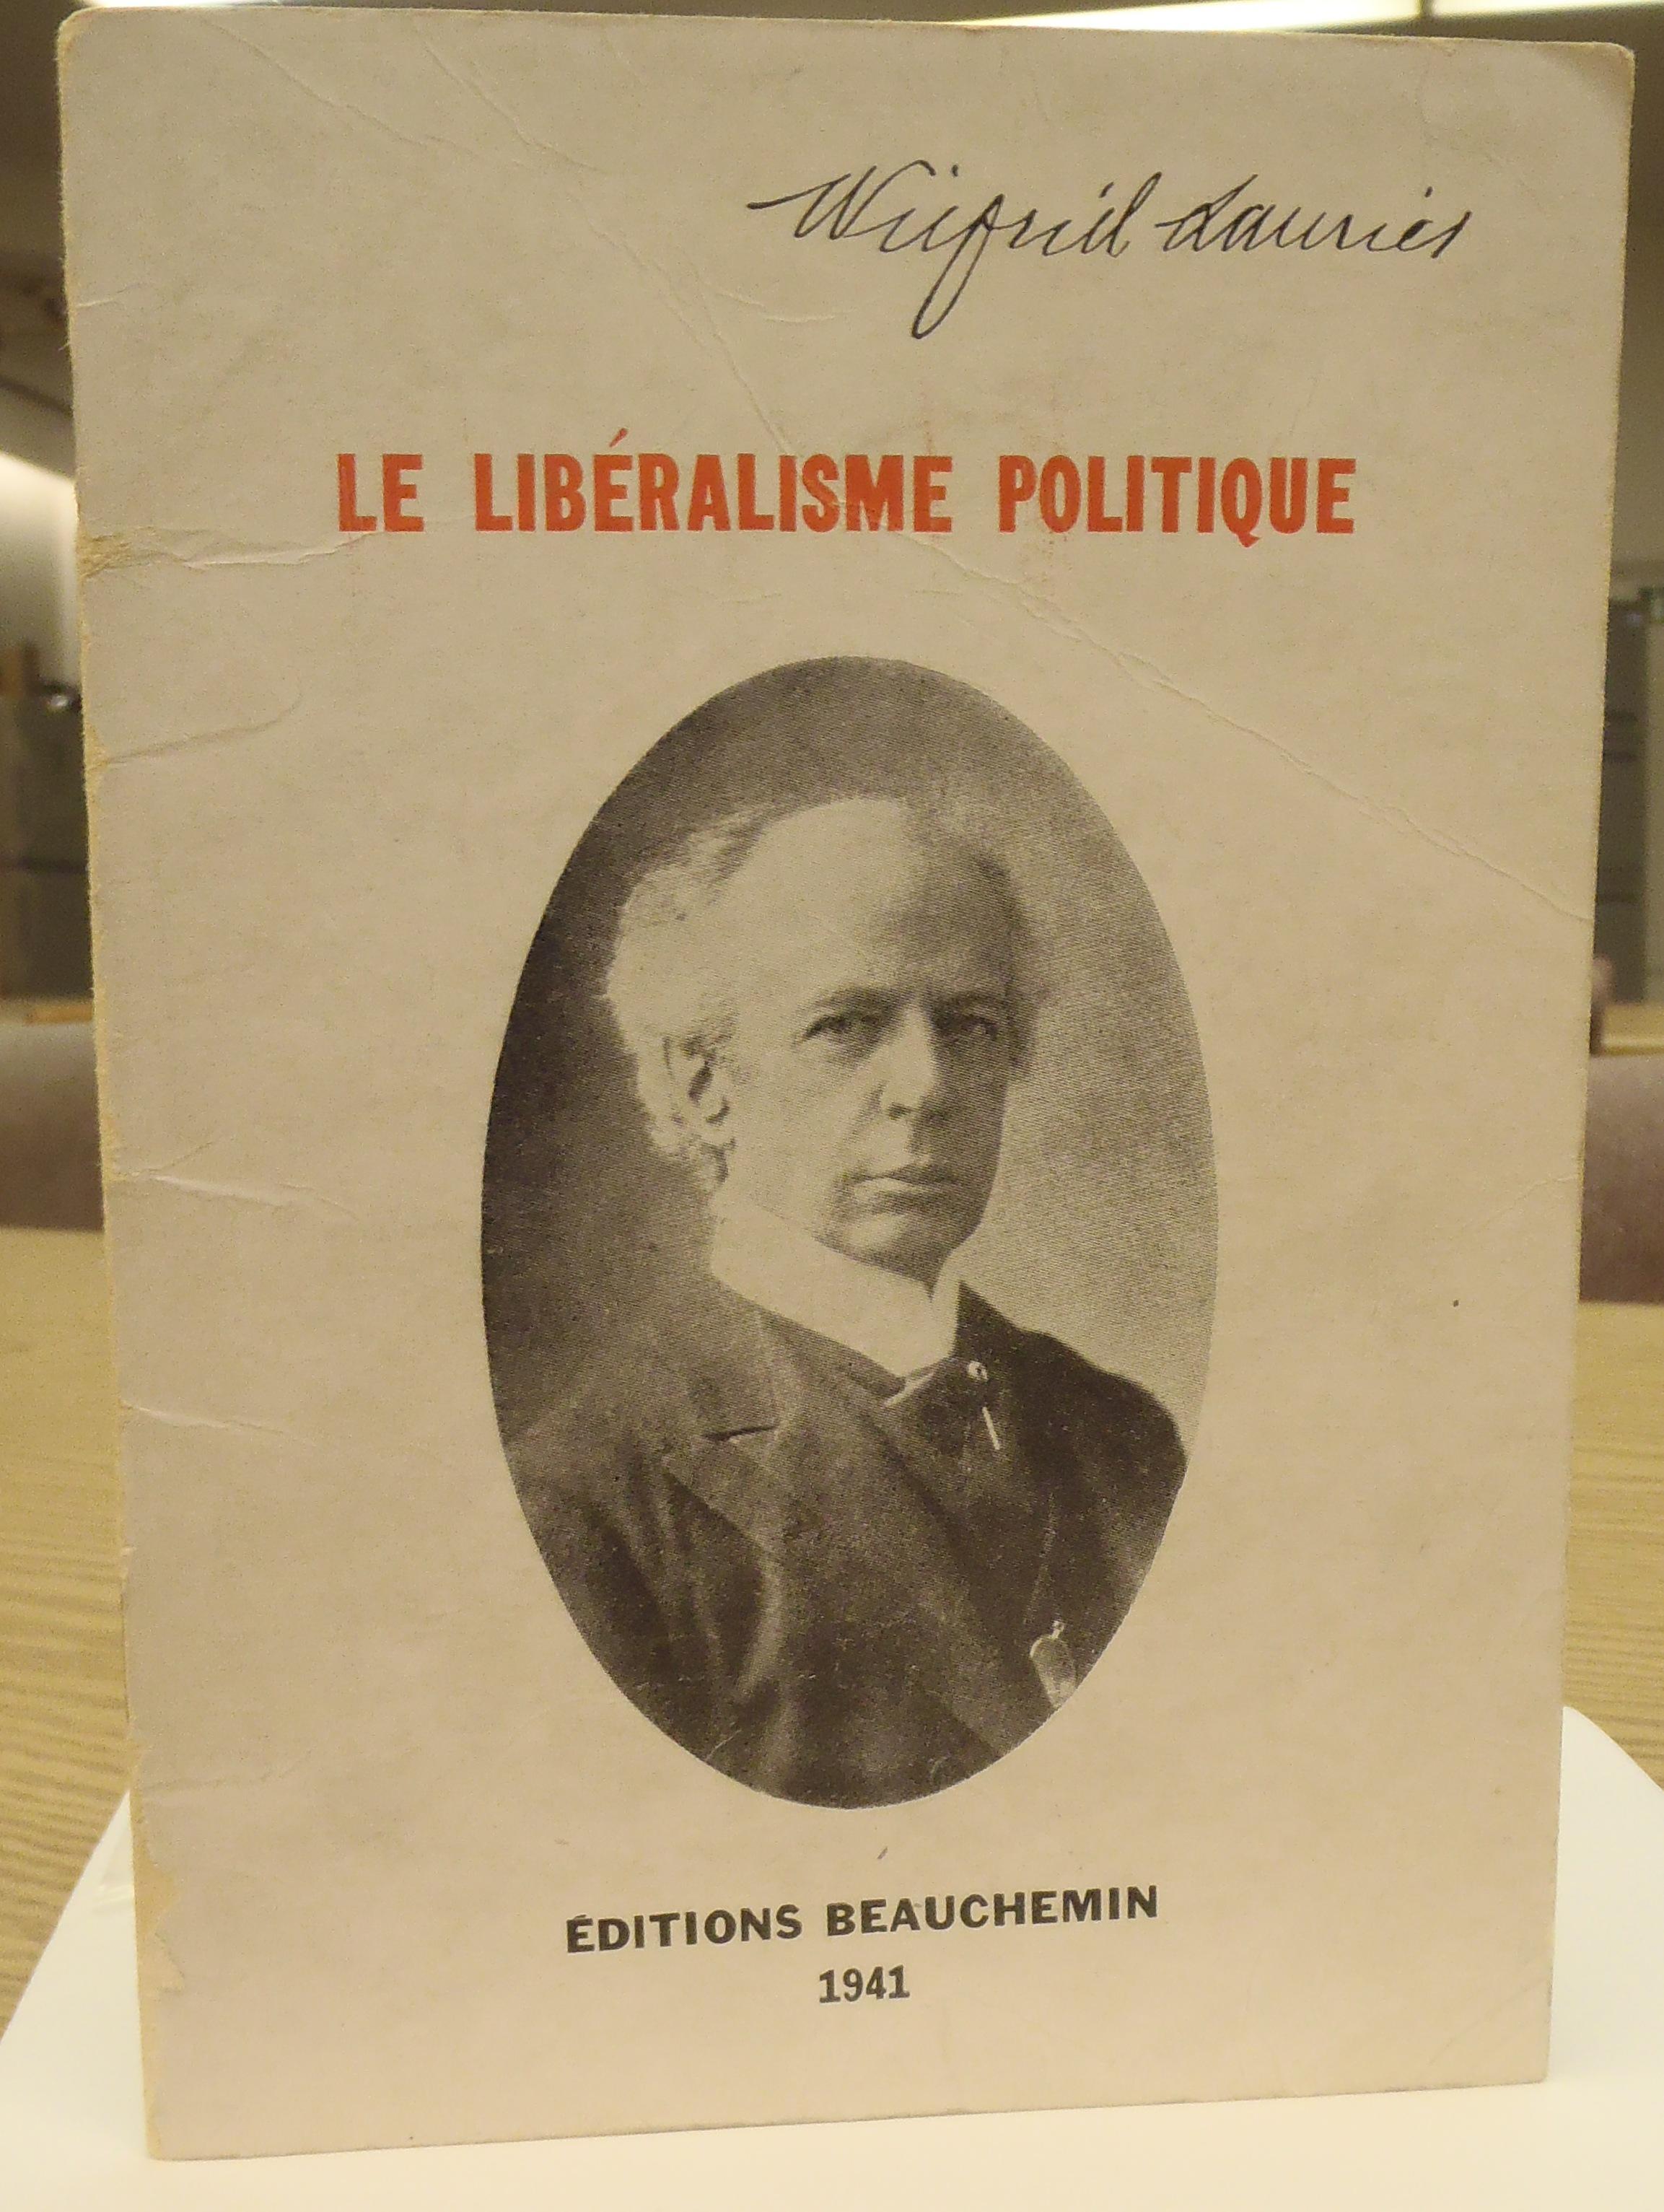 Le libéralisme politique [Political Liberalism] — the classic lecture given by Laurier on June 26, 1877, reissued in 1941. CMH, Library, GEN JL 197 L5 L38 1941. Photo: Xavier Gélinas, PB100739